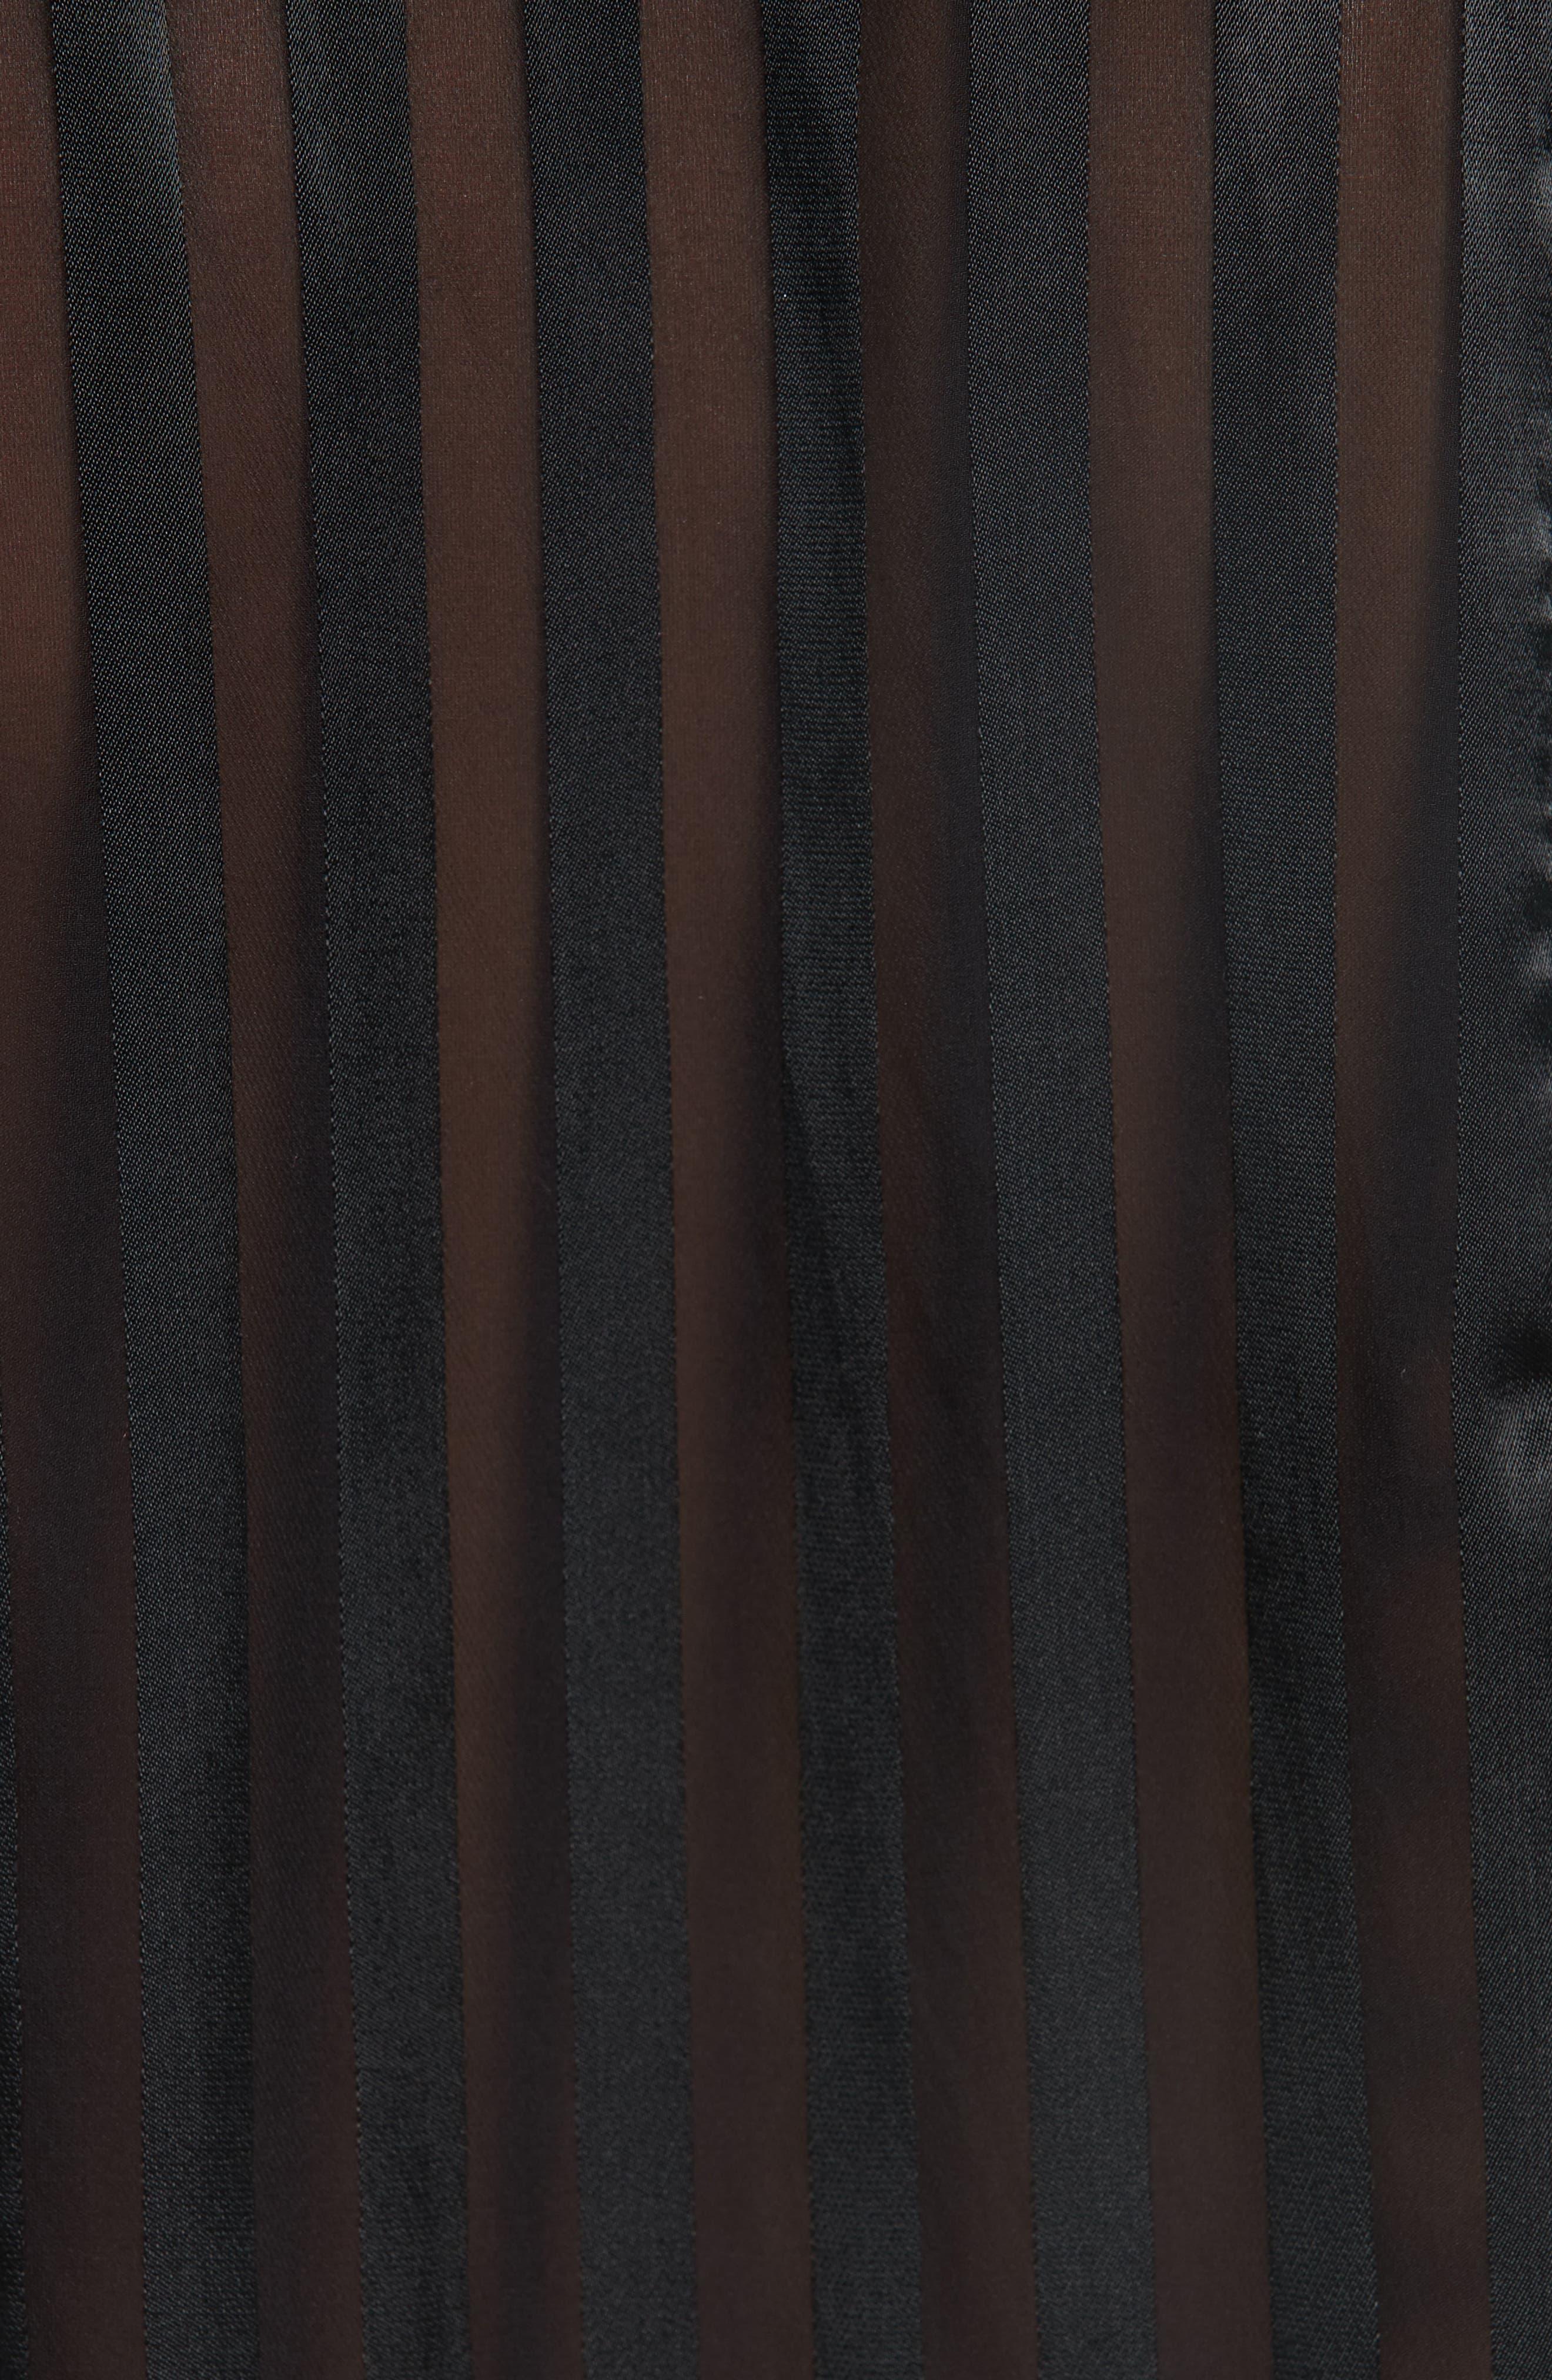 Tie Neck Shadow Stripe Blouse,                             Alternate thumbnail 5, color,                             SHADOW STRIPE BLACK